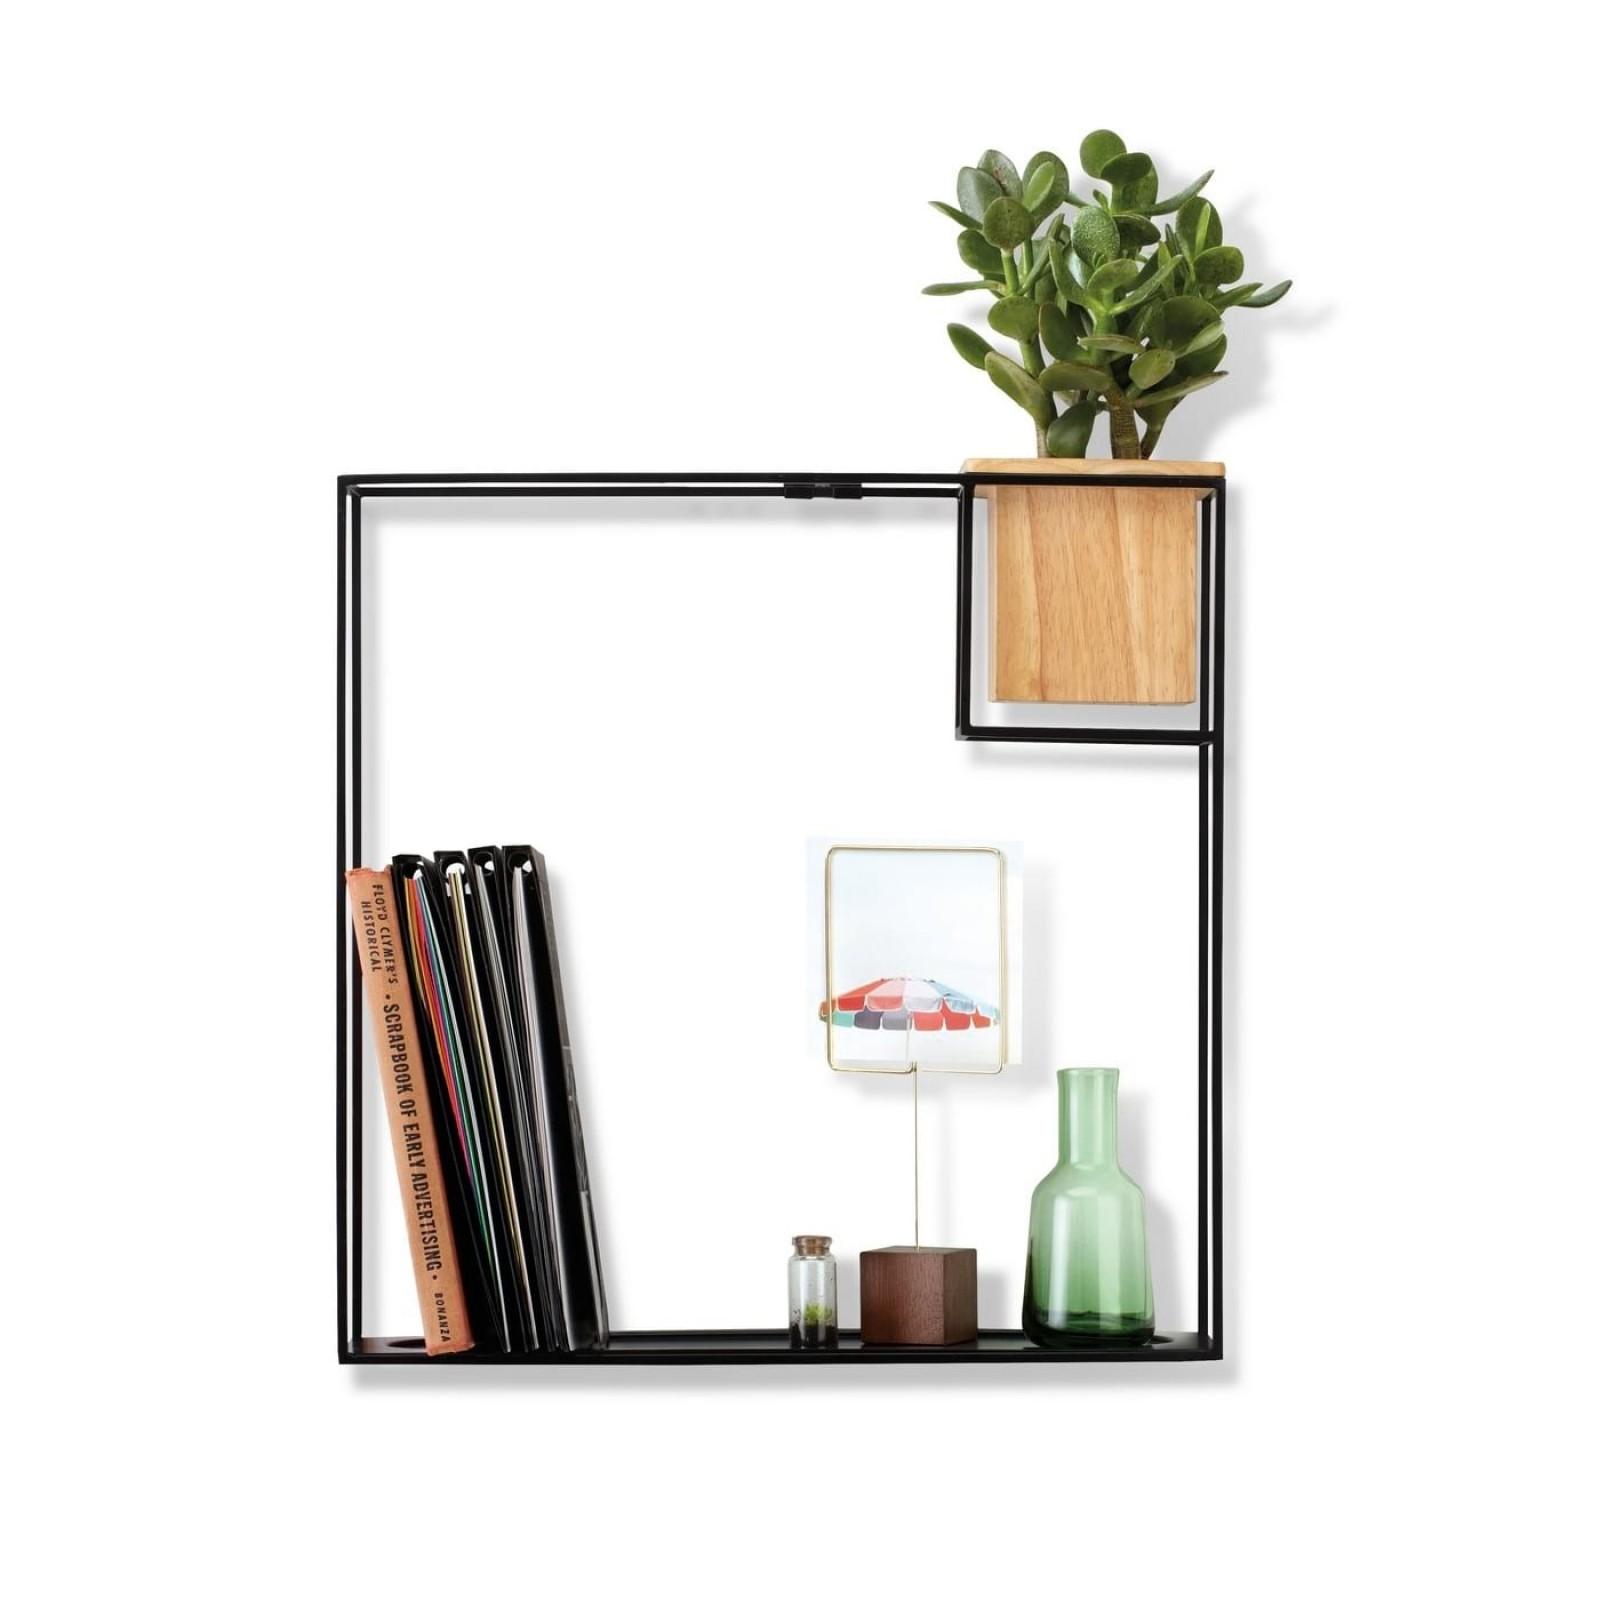 Cubist Large Wall Shelf (Black) - Umbra